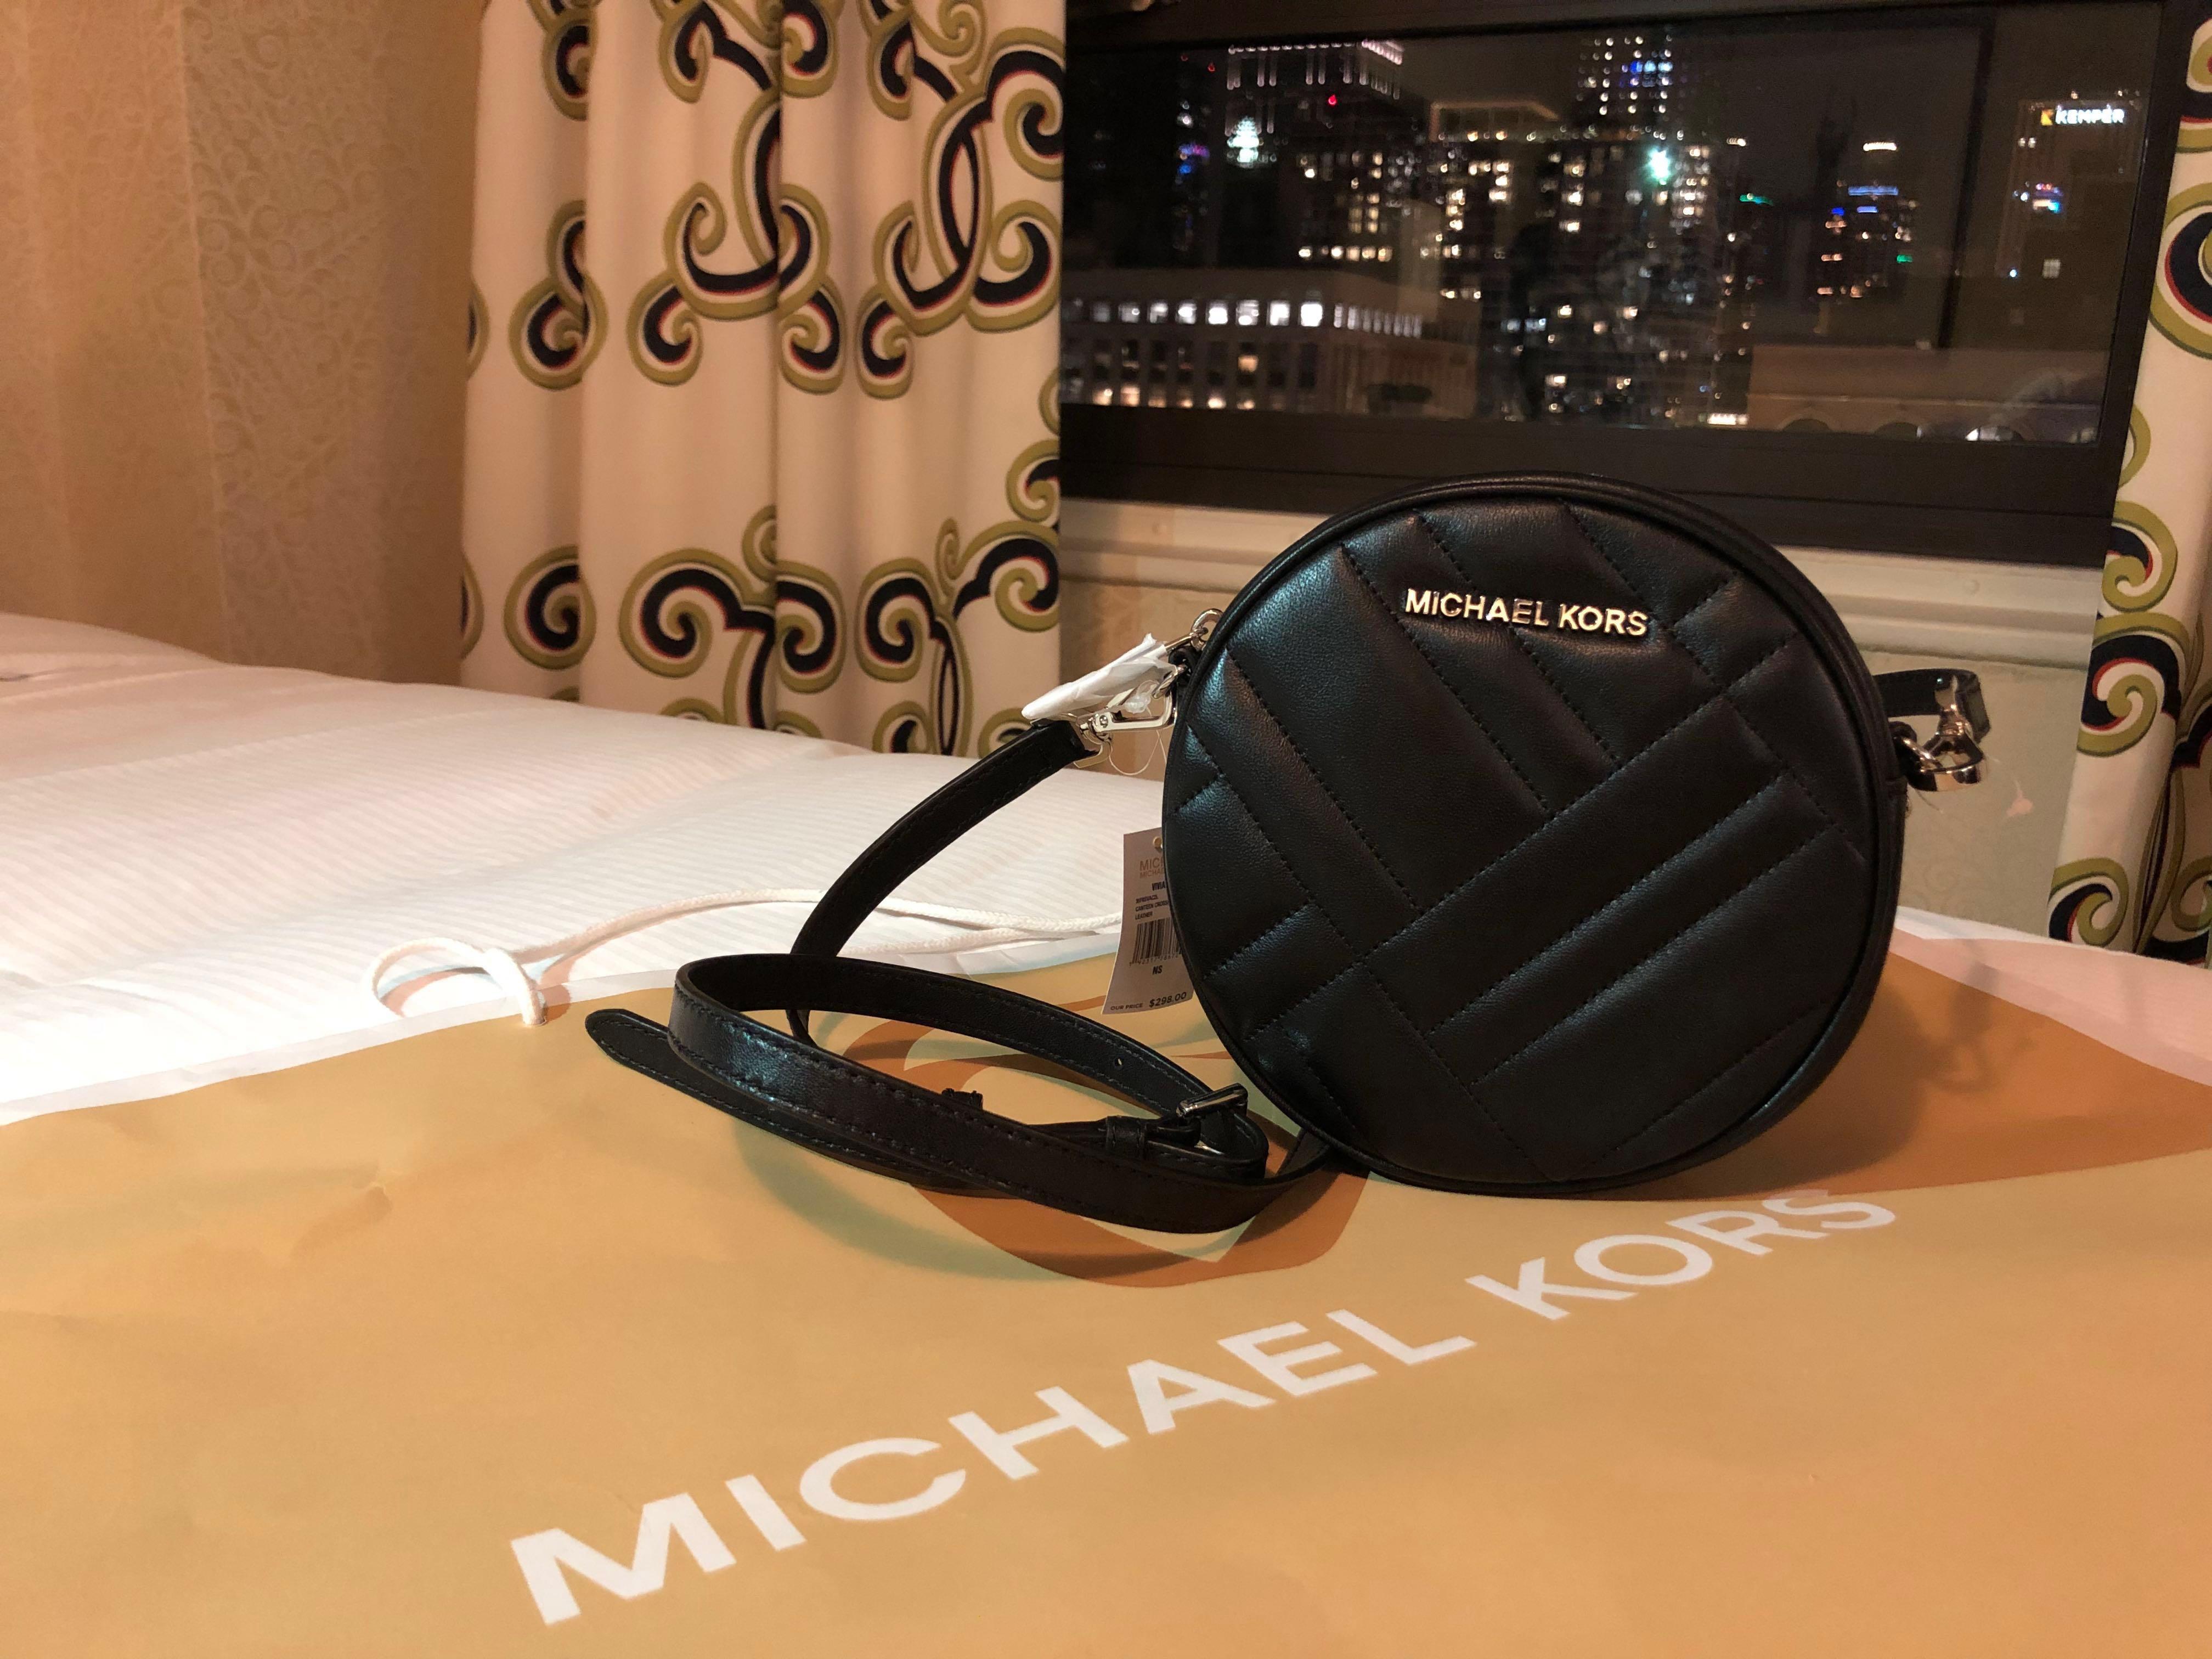 c1e1ffcde32d Authentic   New) Michael Kors crossbody   sling - Vivianne Edition ...